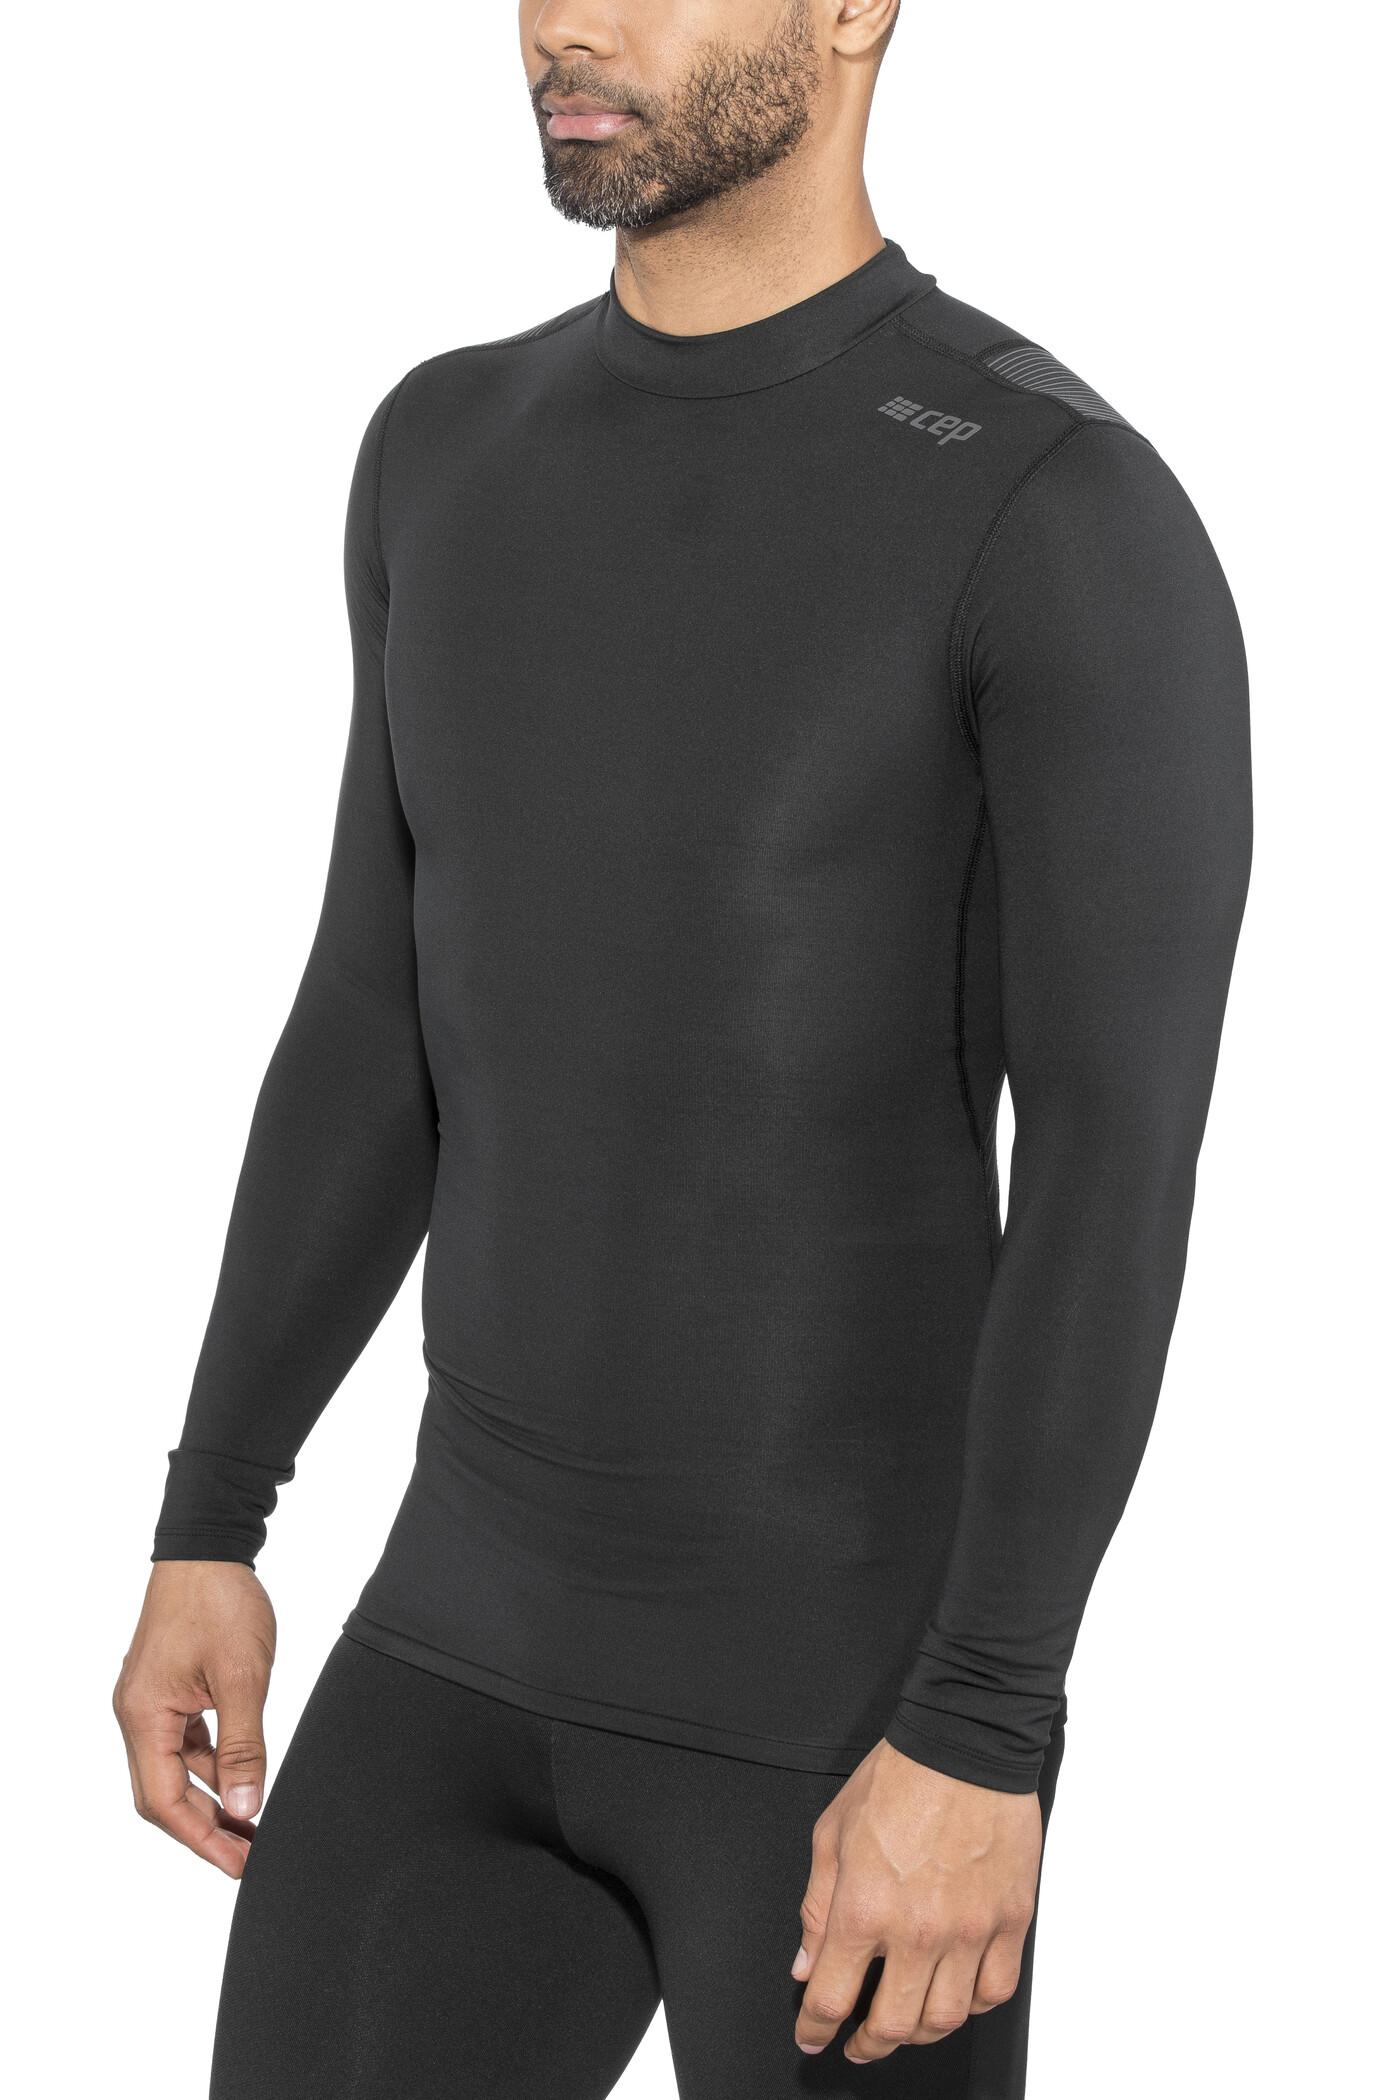 cep Winter Wingtech Langærmet T-shirt Herrer, black (2019) | Jerseys